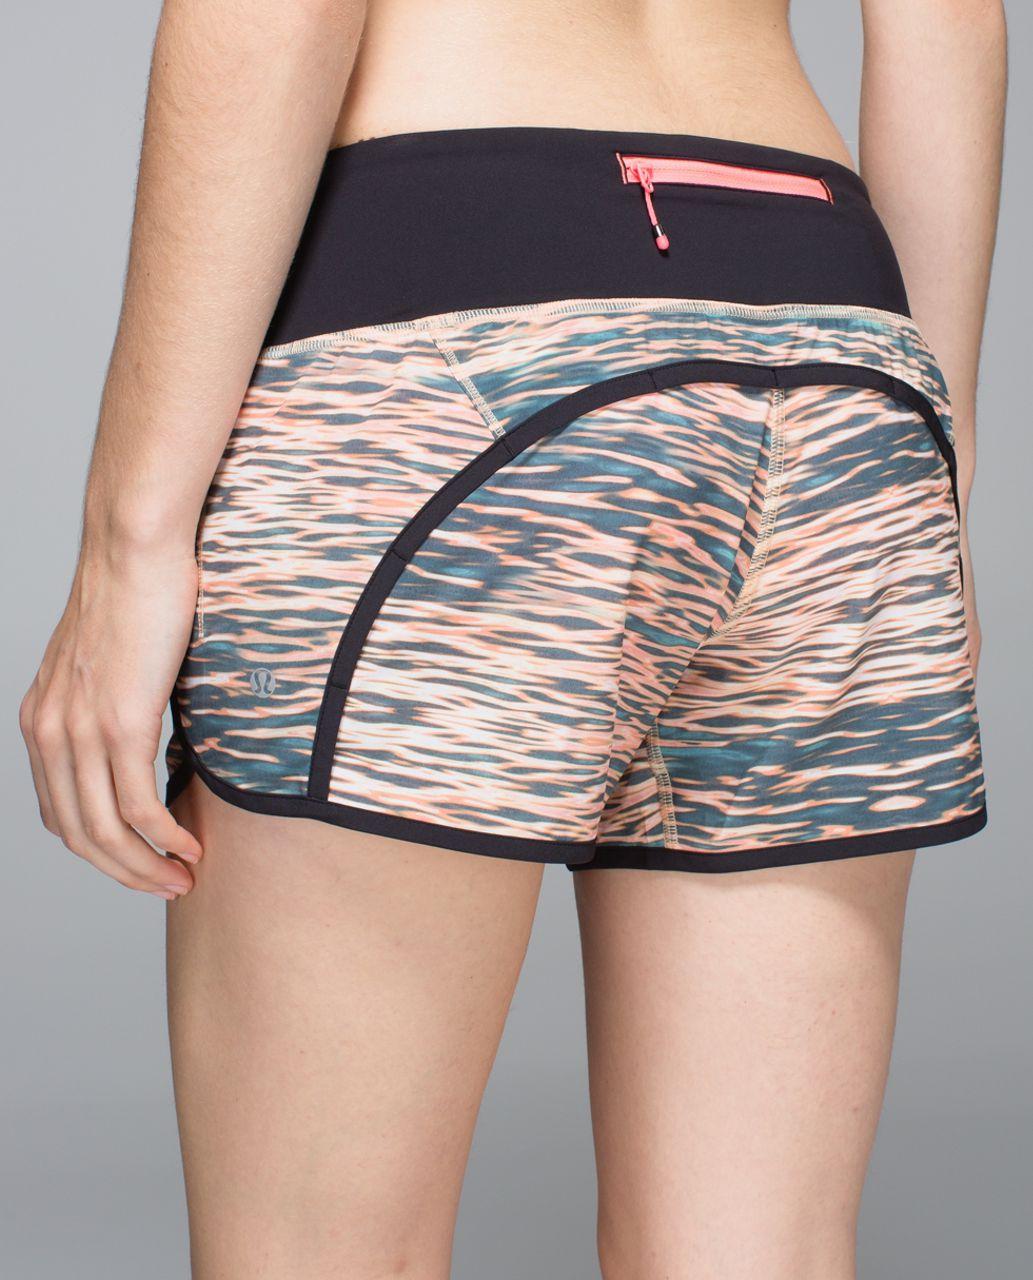 Lululemon Run Times Short *4-way Stretch - Tiger Water Multi / Black